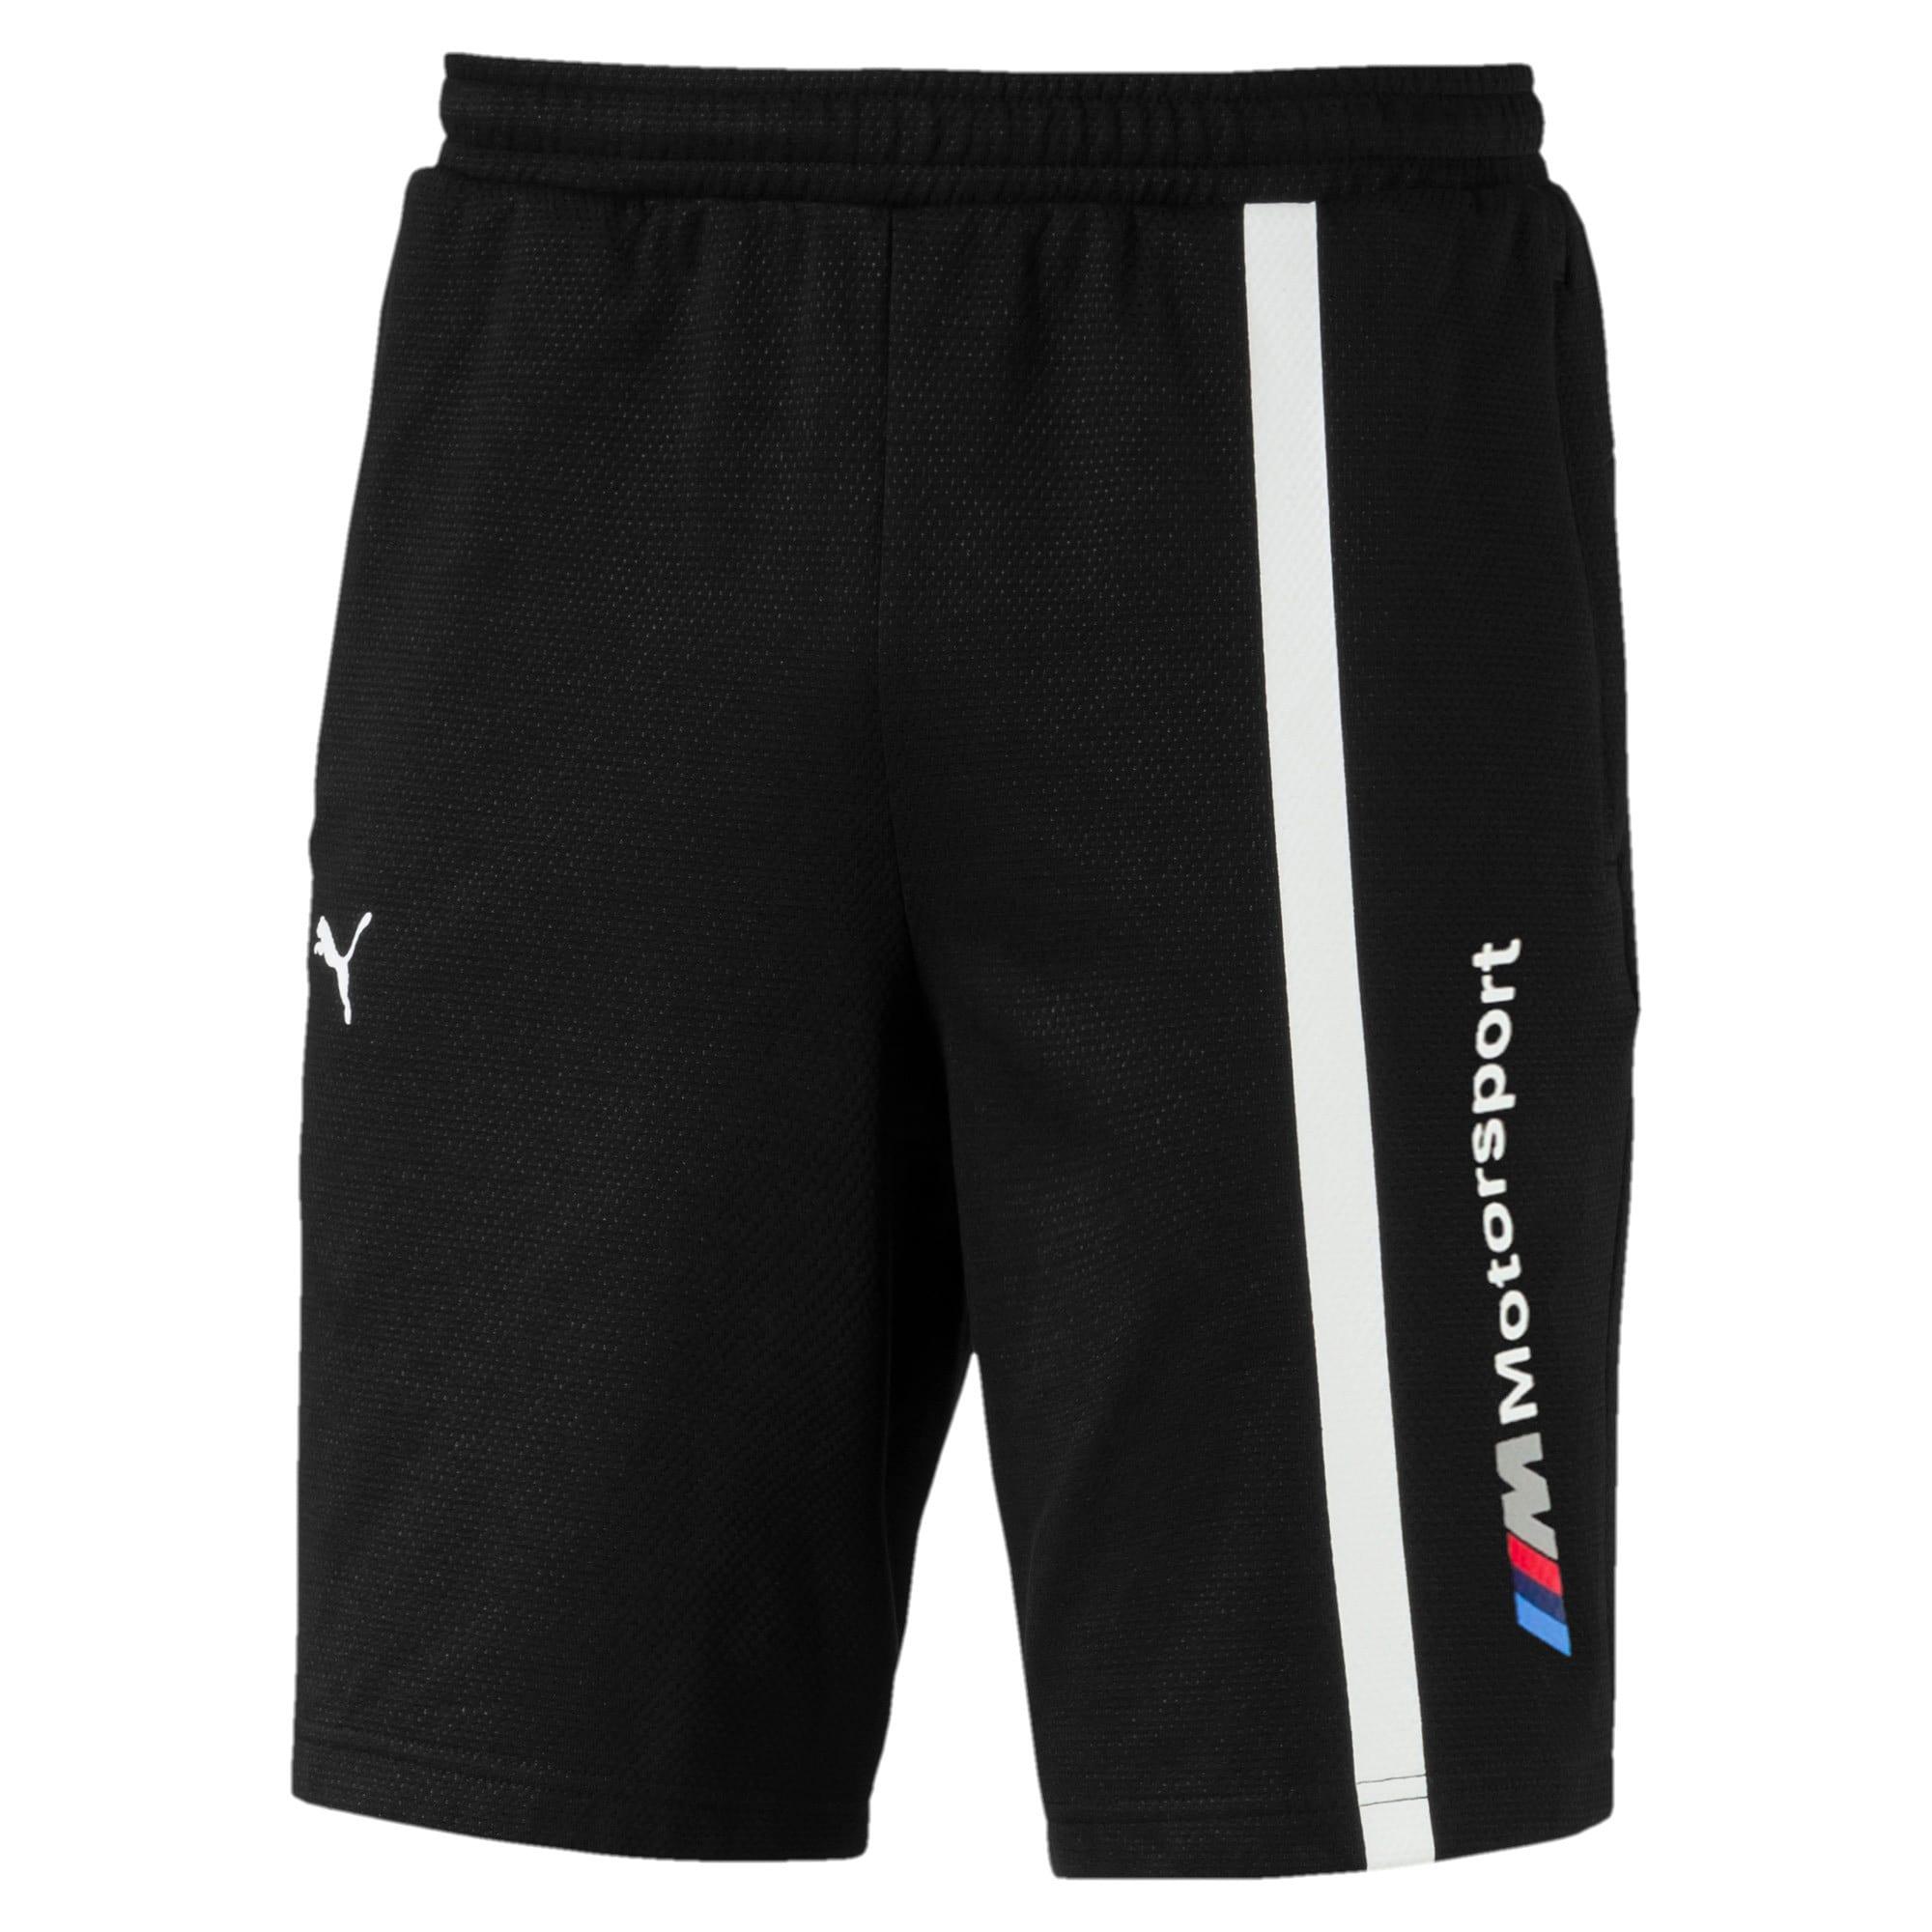 Thumbnail 4 of BMW Motorsport Men's Sweat Shorts, Puma Black, medium